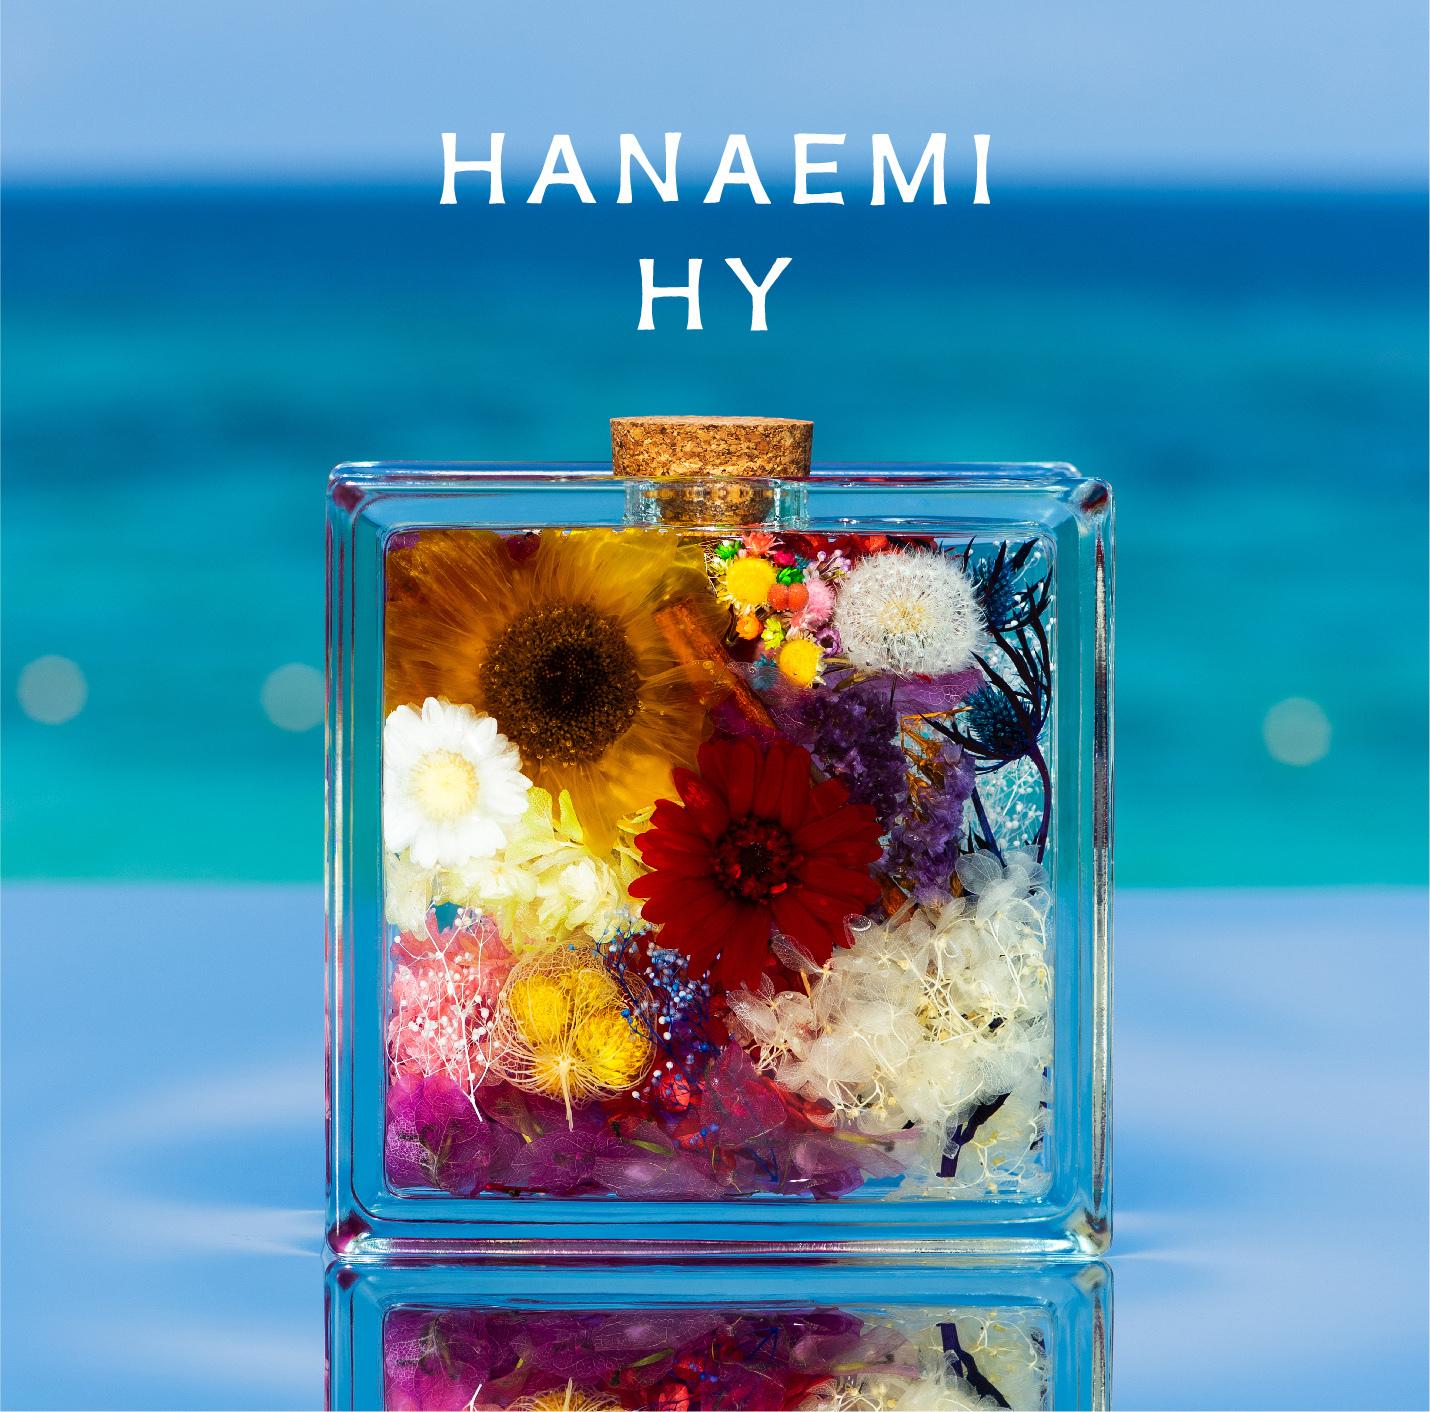 『HANAEMI』ジャケット